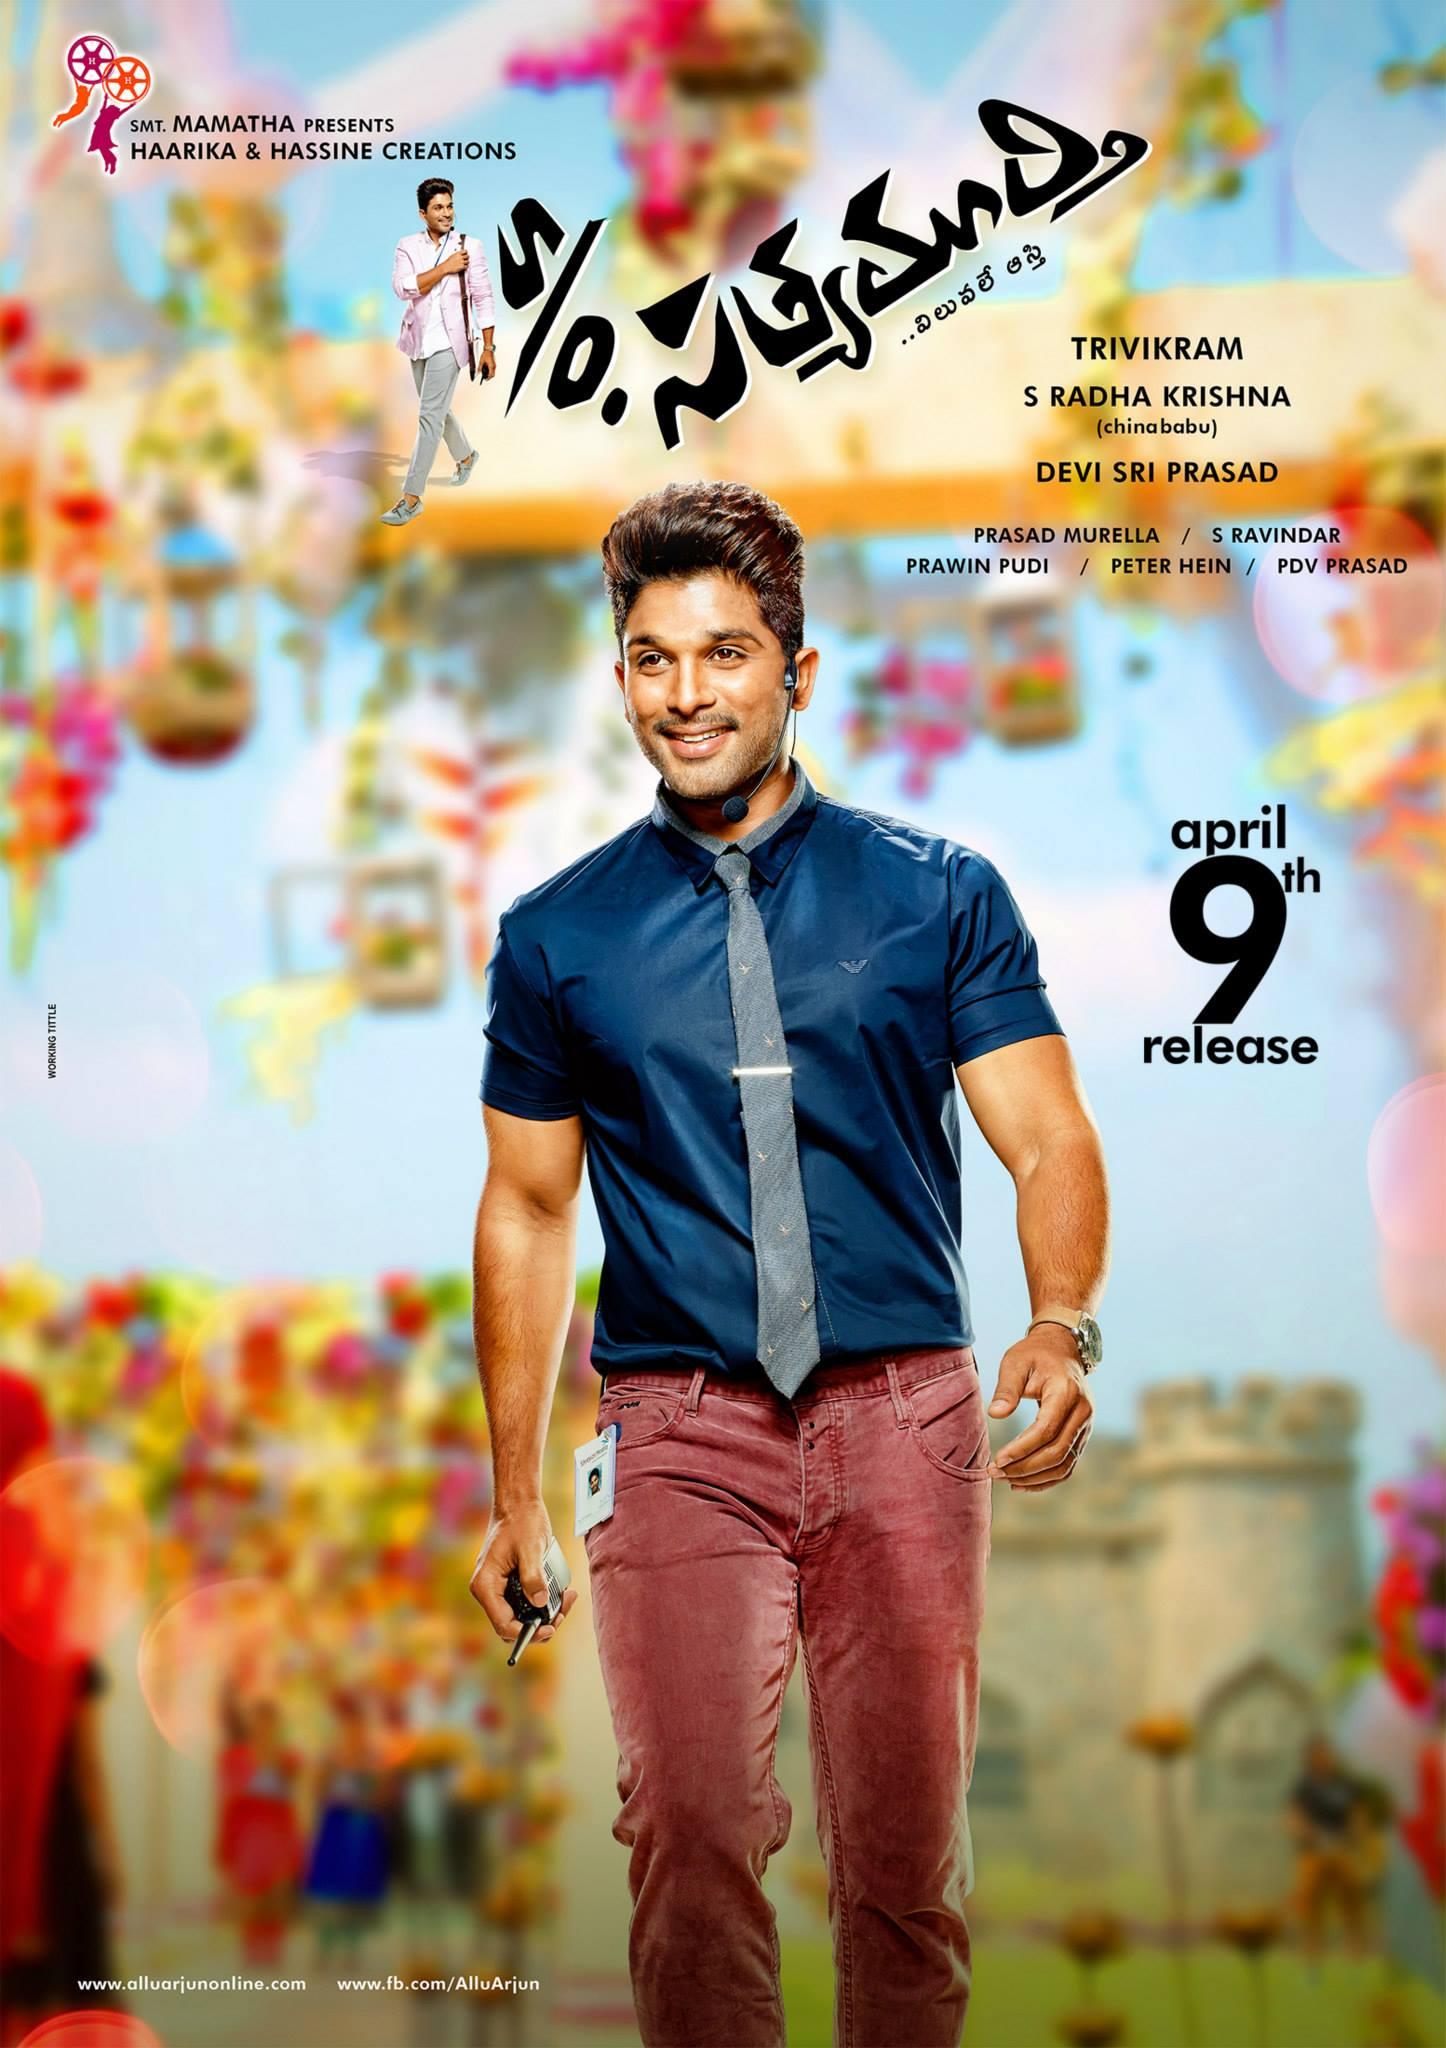 Son Of Satyamurthy (2015) Blu-Ray 1080p Telugu DTS-HD MA 5.1 AVC REMUX ~ SaturnWeb